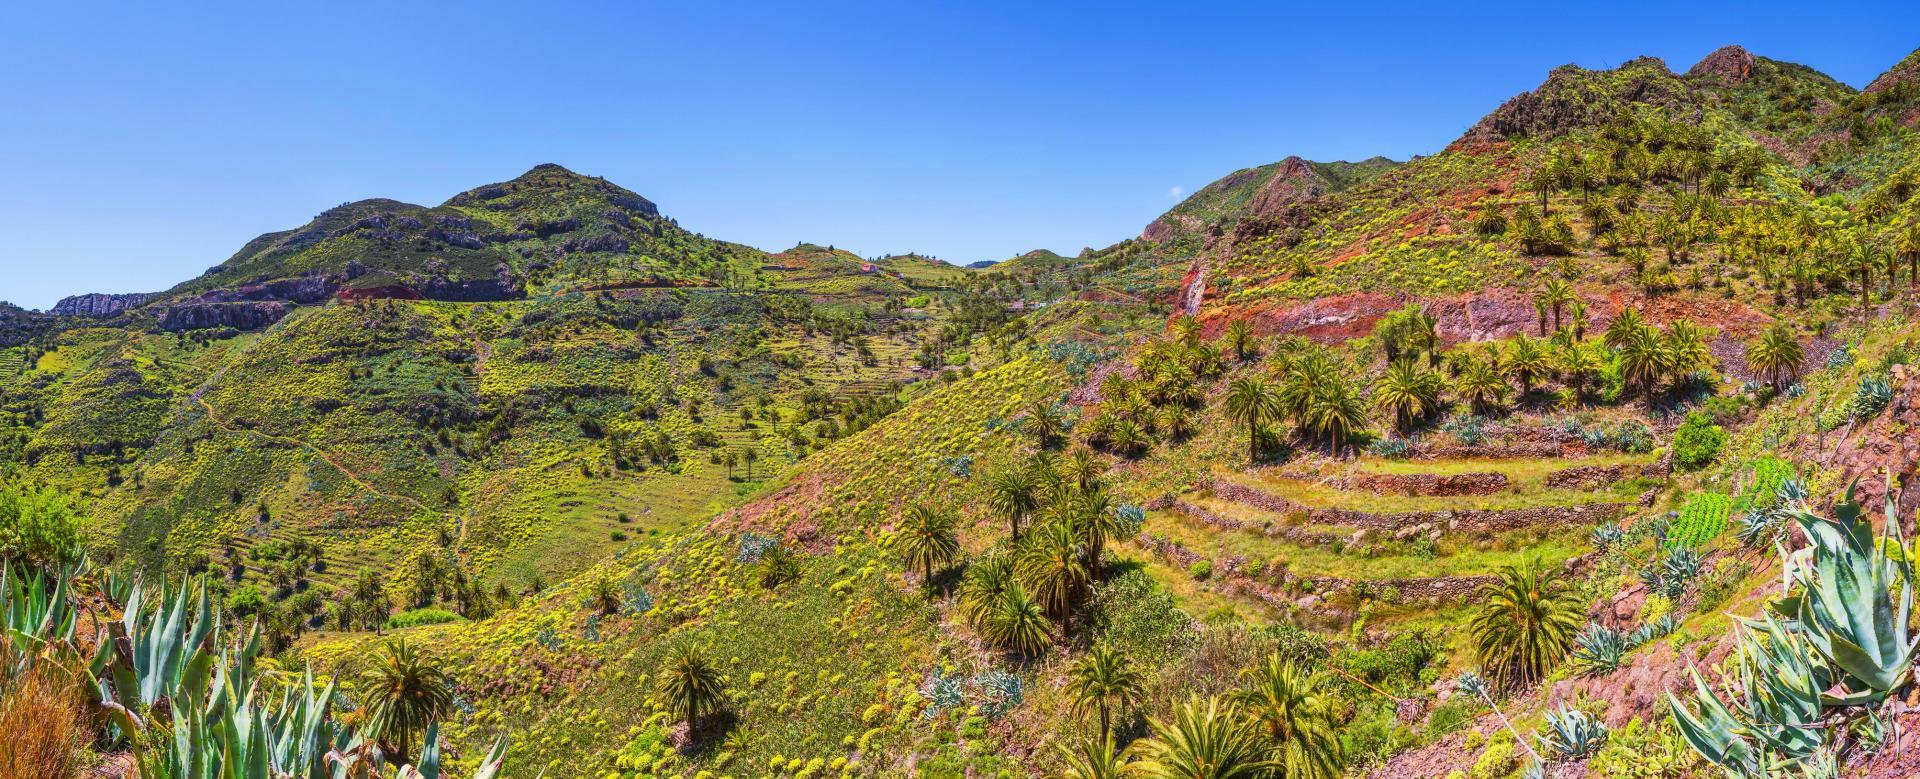 Voyage à pied Espagne : Tenerife, la palma et la gomera